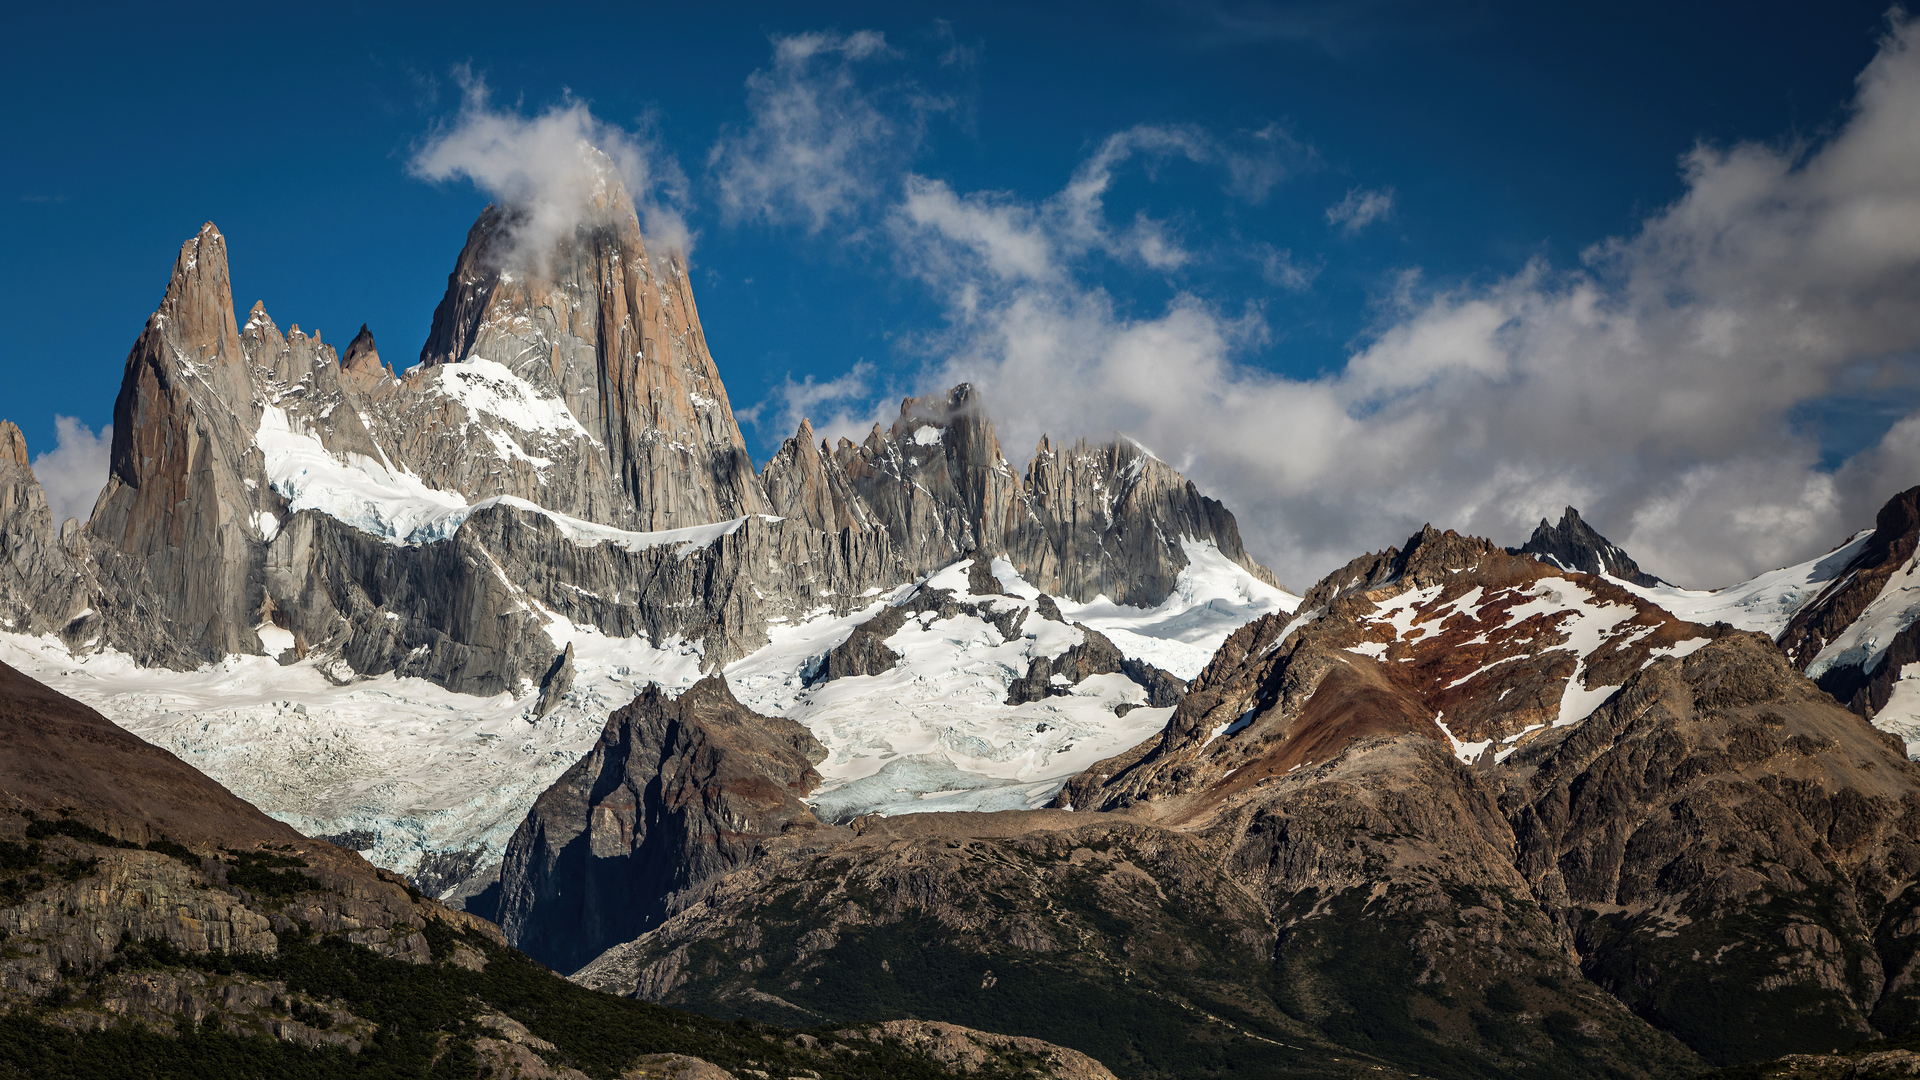 argentina-mountains-clouds-5k-ee.jpg